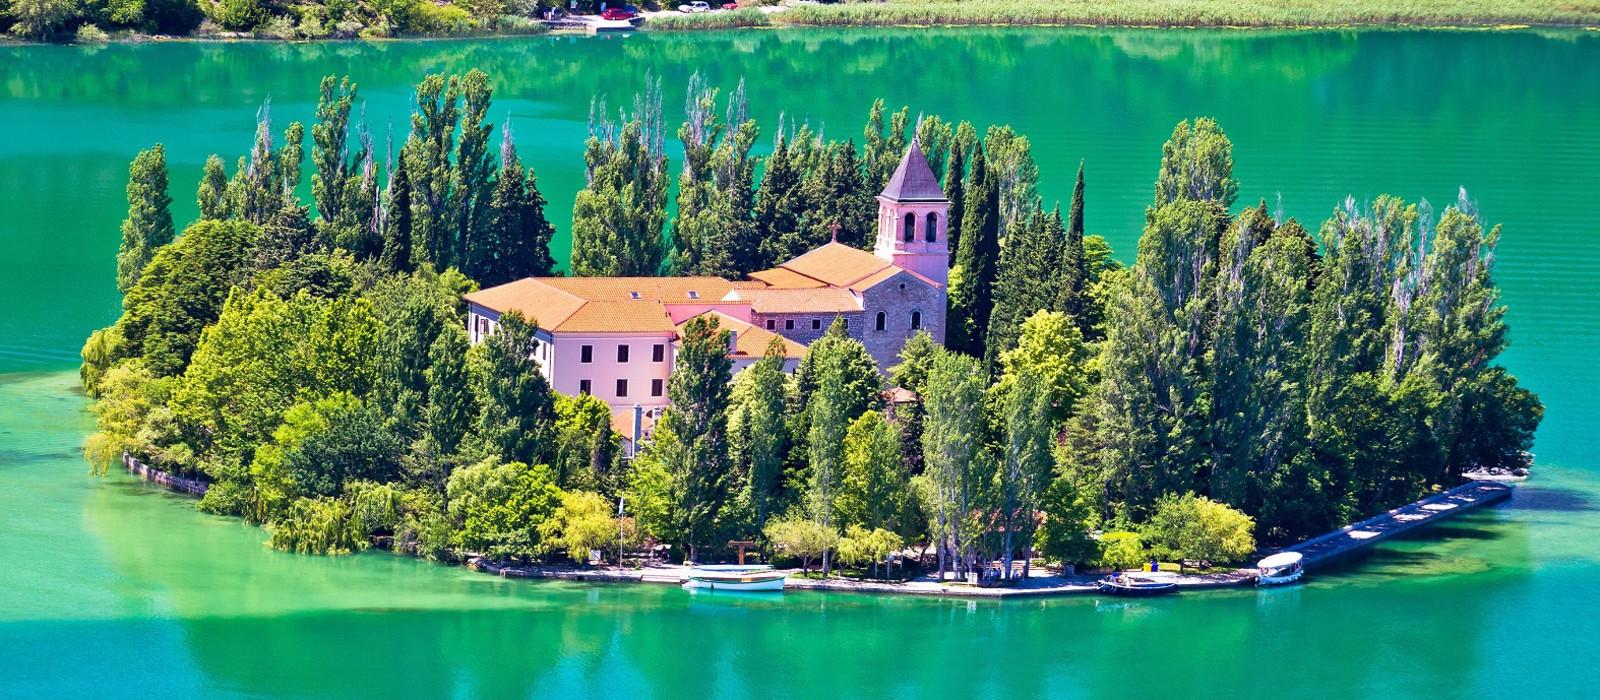 Visovac Insel mit Kloster in Dalmatien, Kroatien